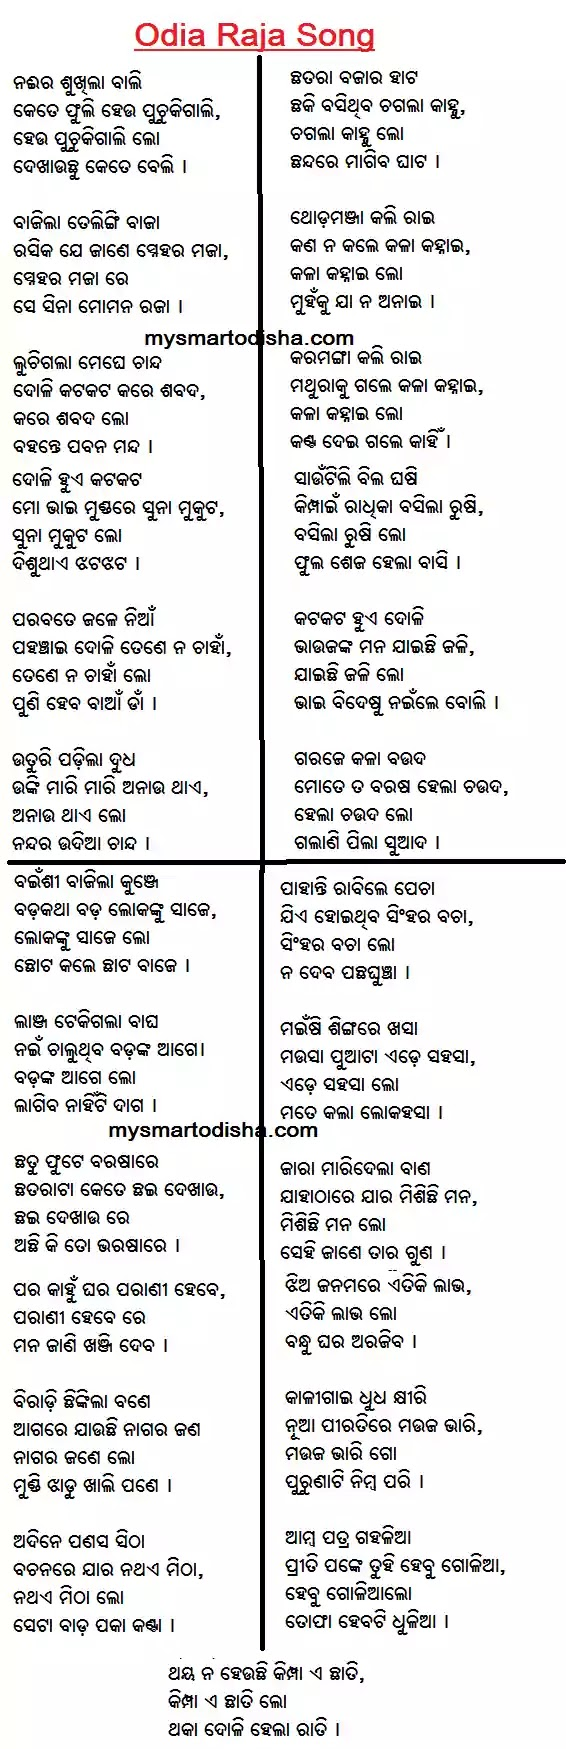 Odia Raja Song Lyrics